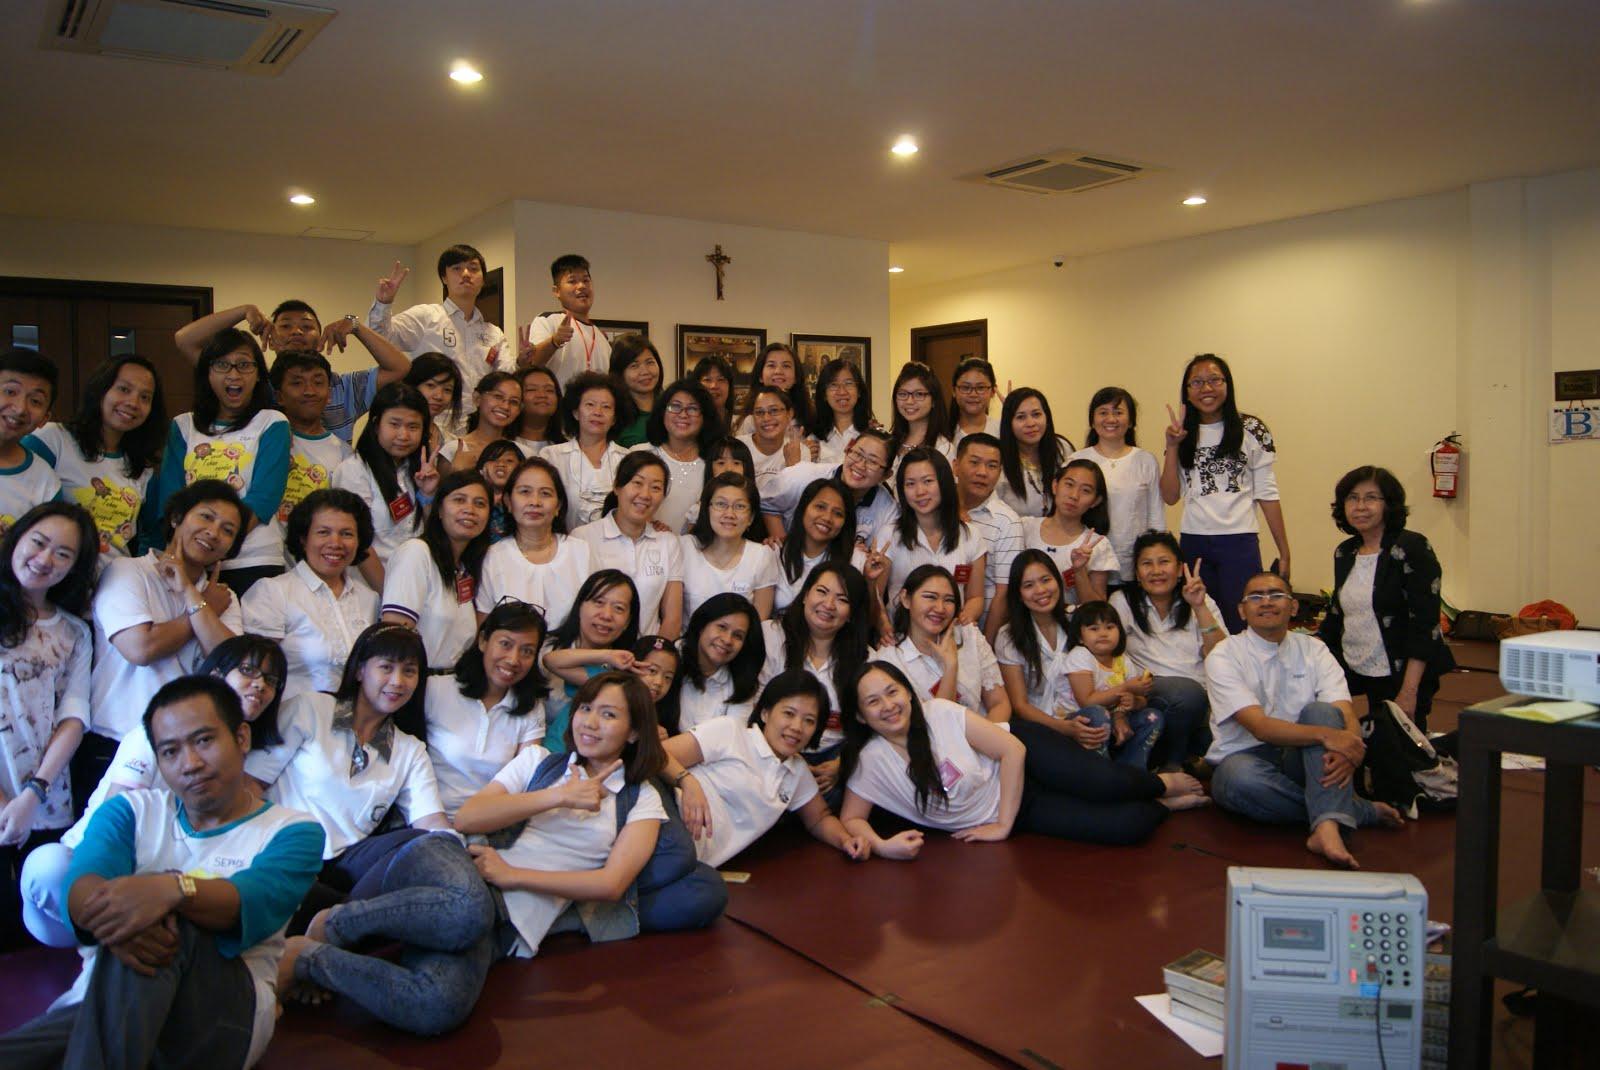 Bersama Para Pendamping BIAK Paroki ST.Yakobus Surabaya 19-20 September 2015